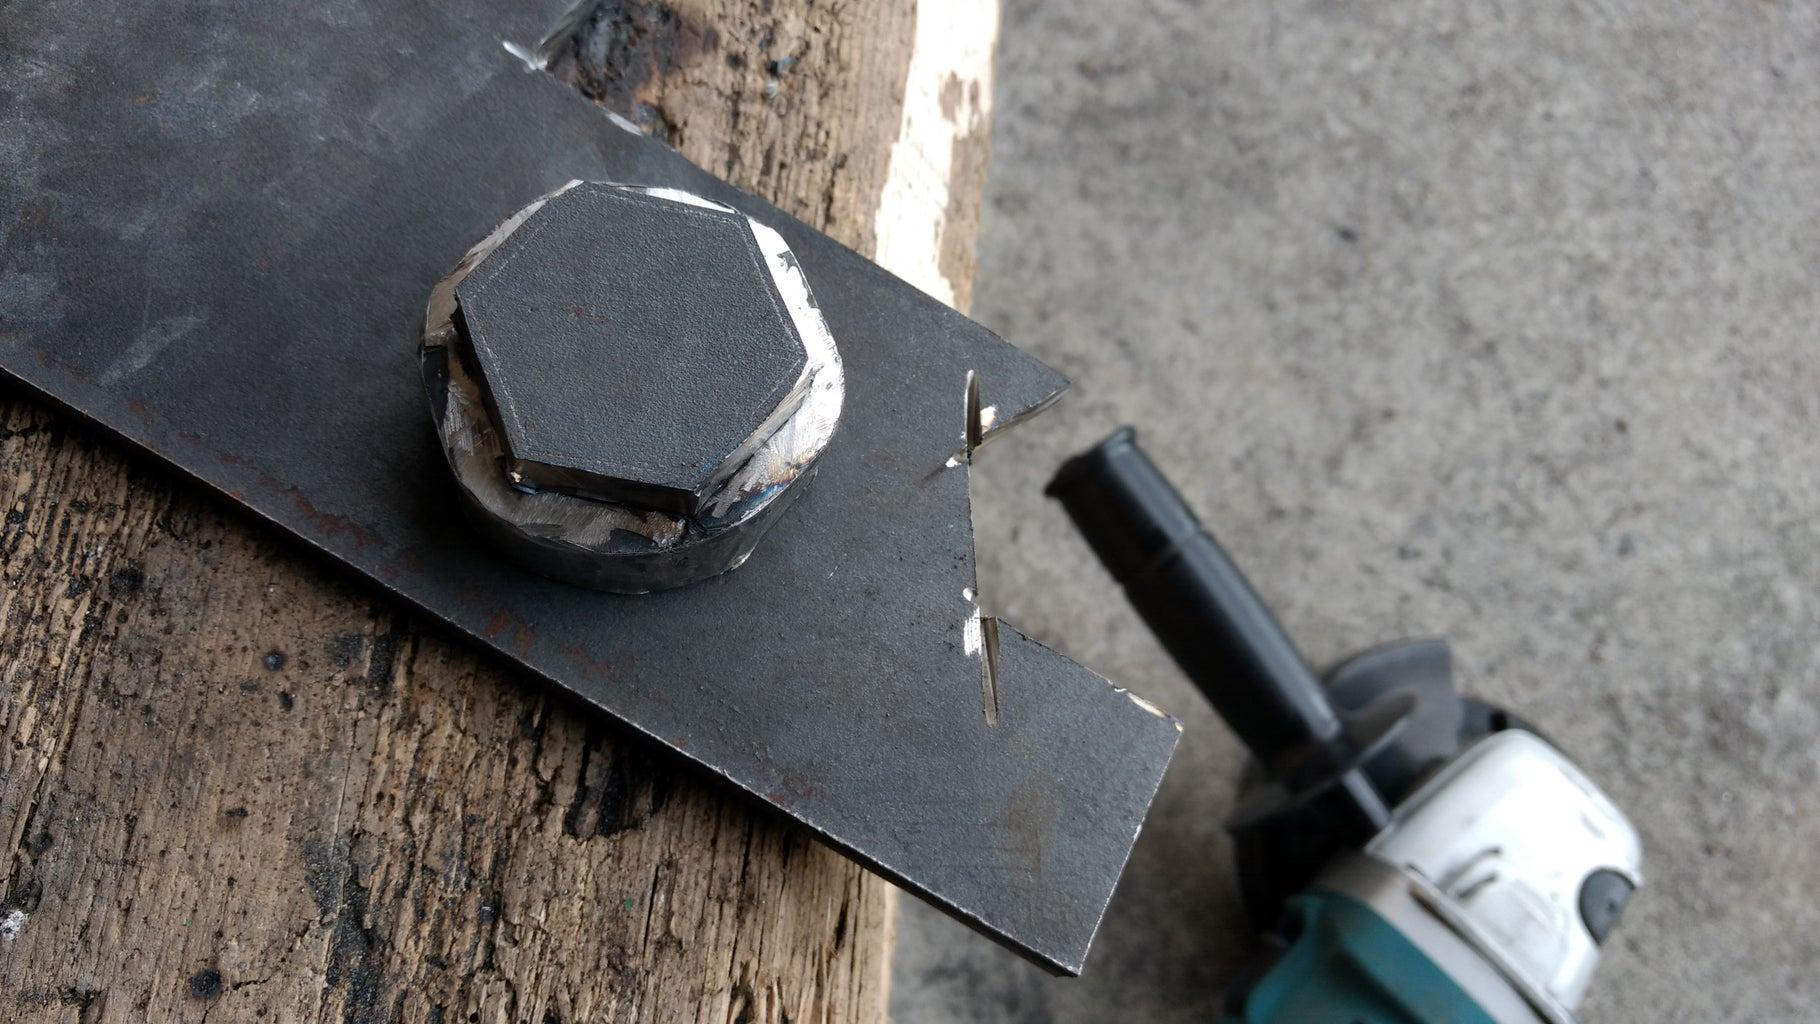 Welding It As a Box Spanner: